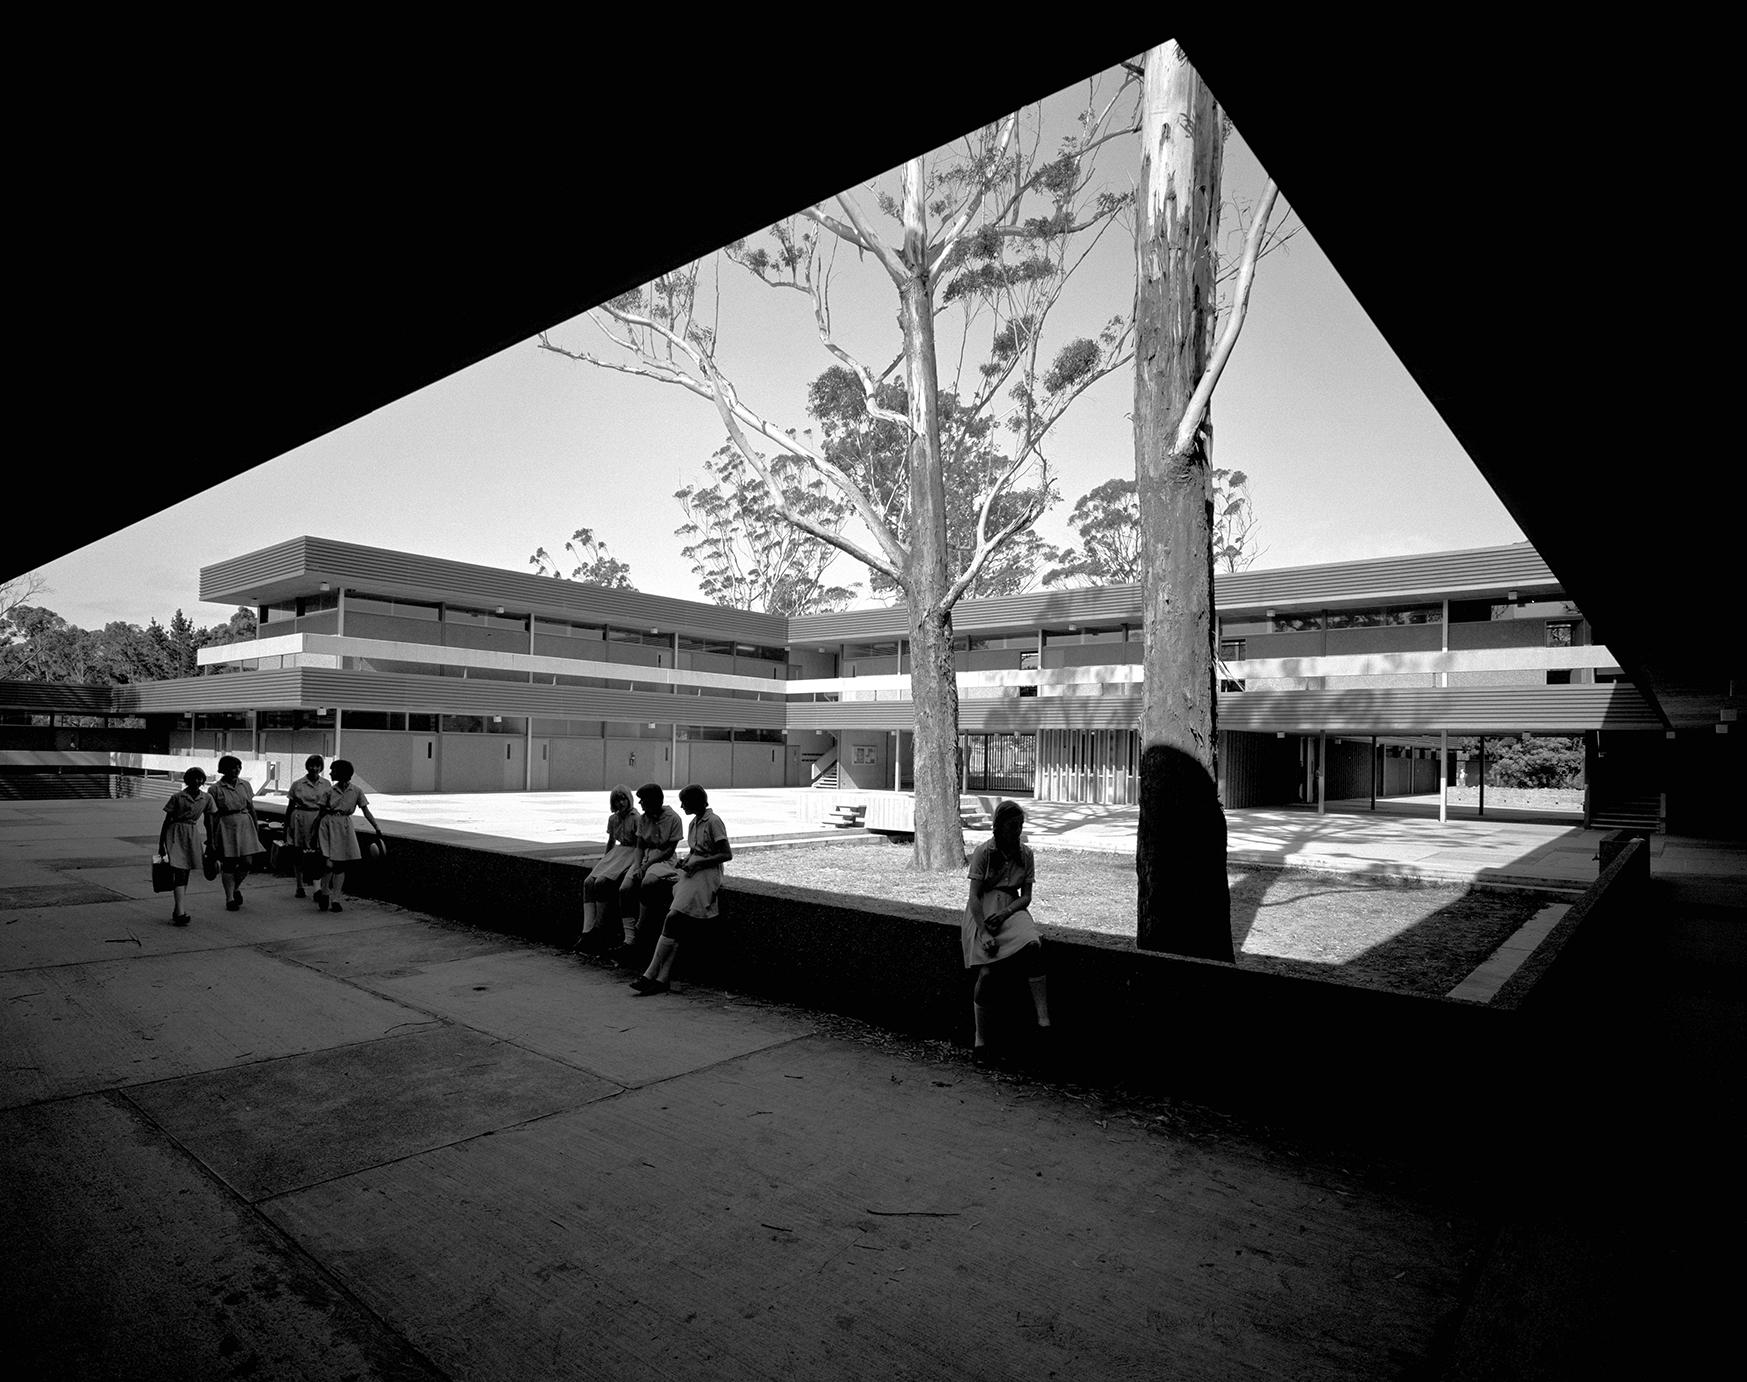 Pennant Hills High School, 1967, photo by Max Dupain & Associates